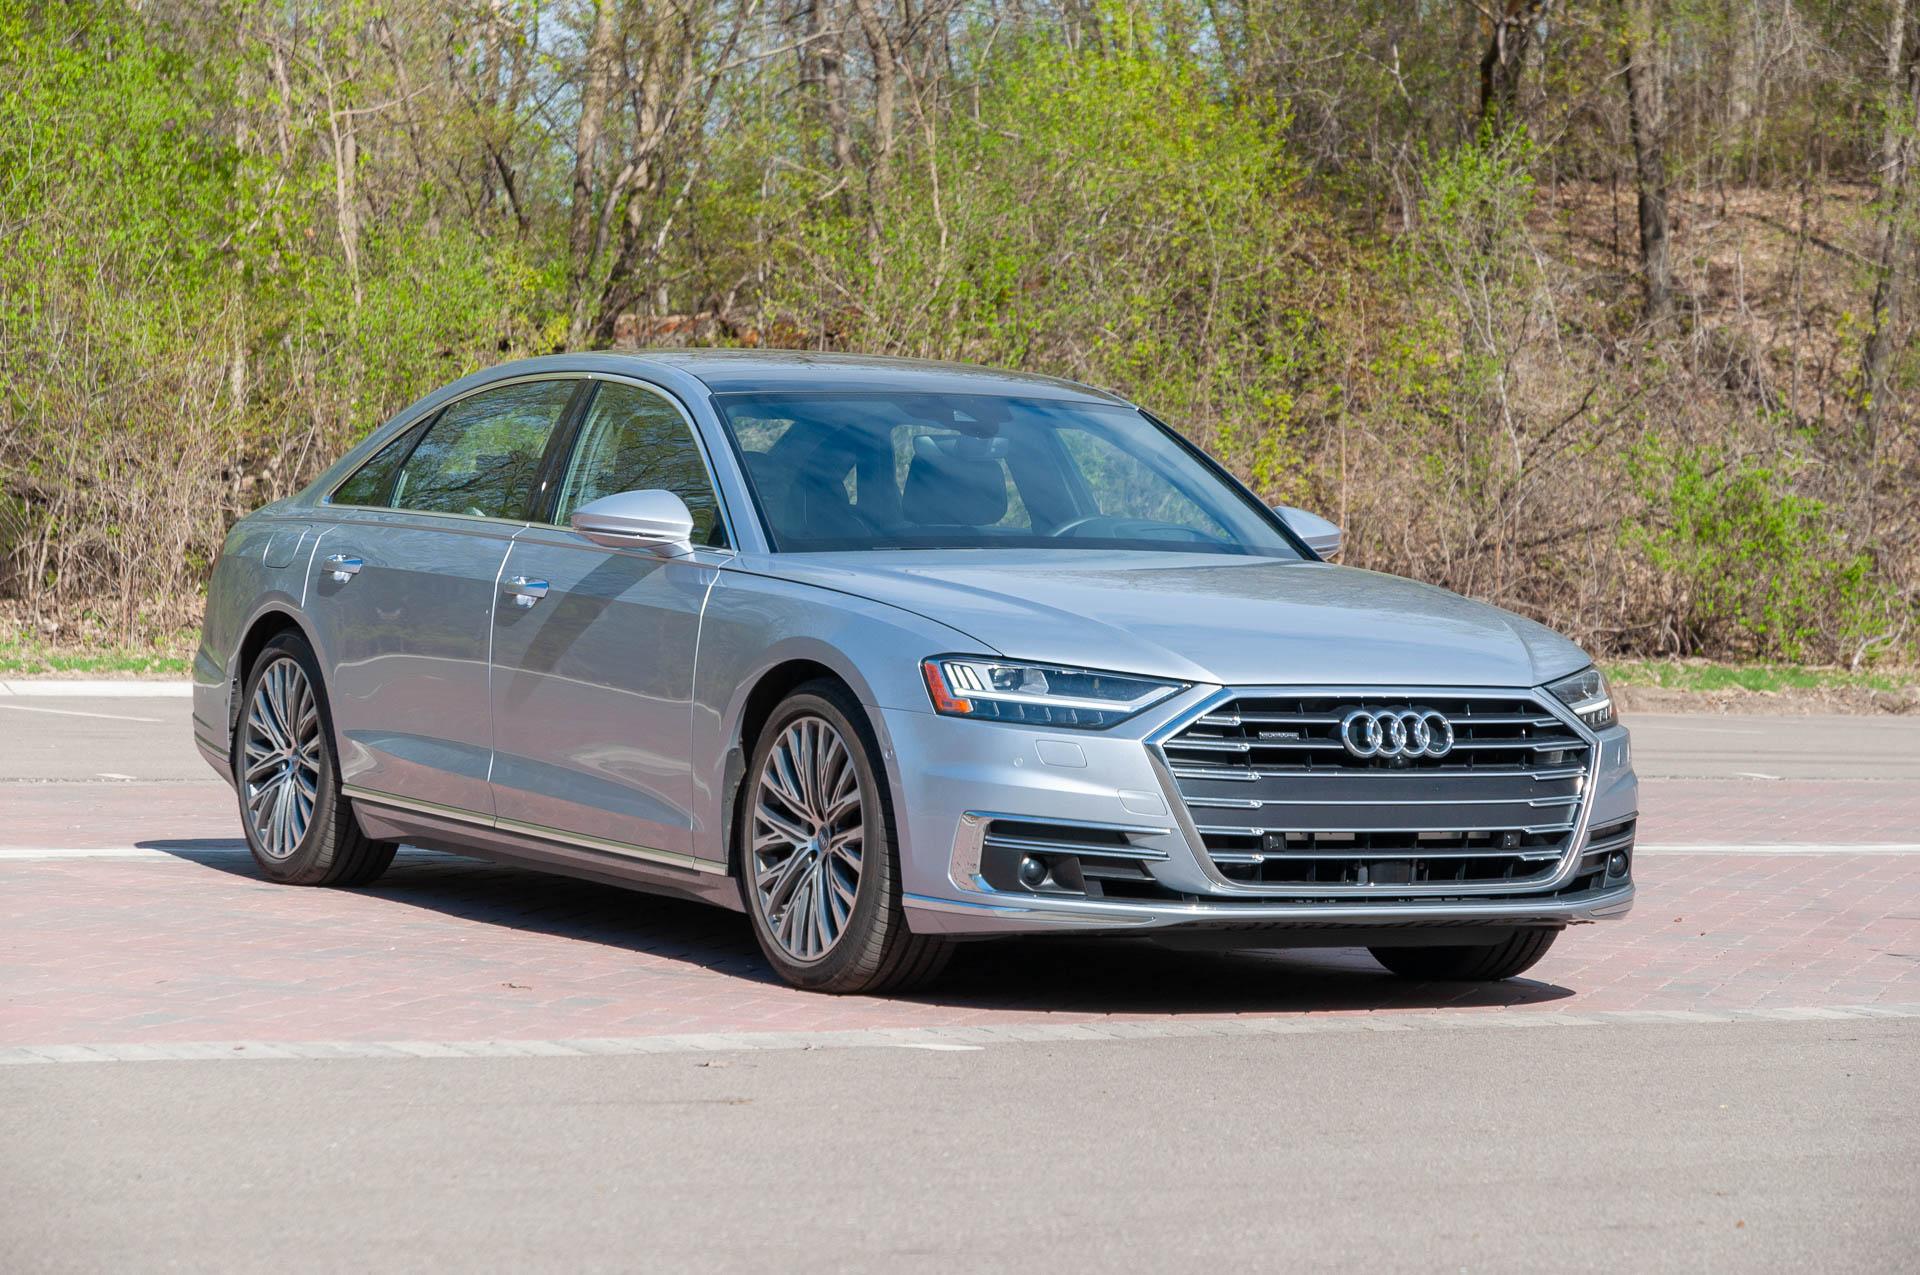 Kekurangan Audi A8L 2019 Top Model Tahun Ini